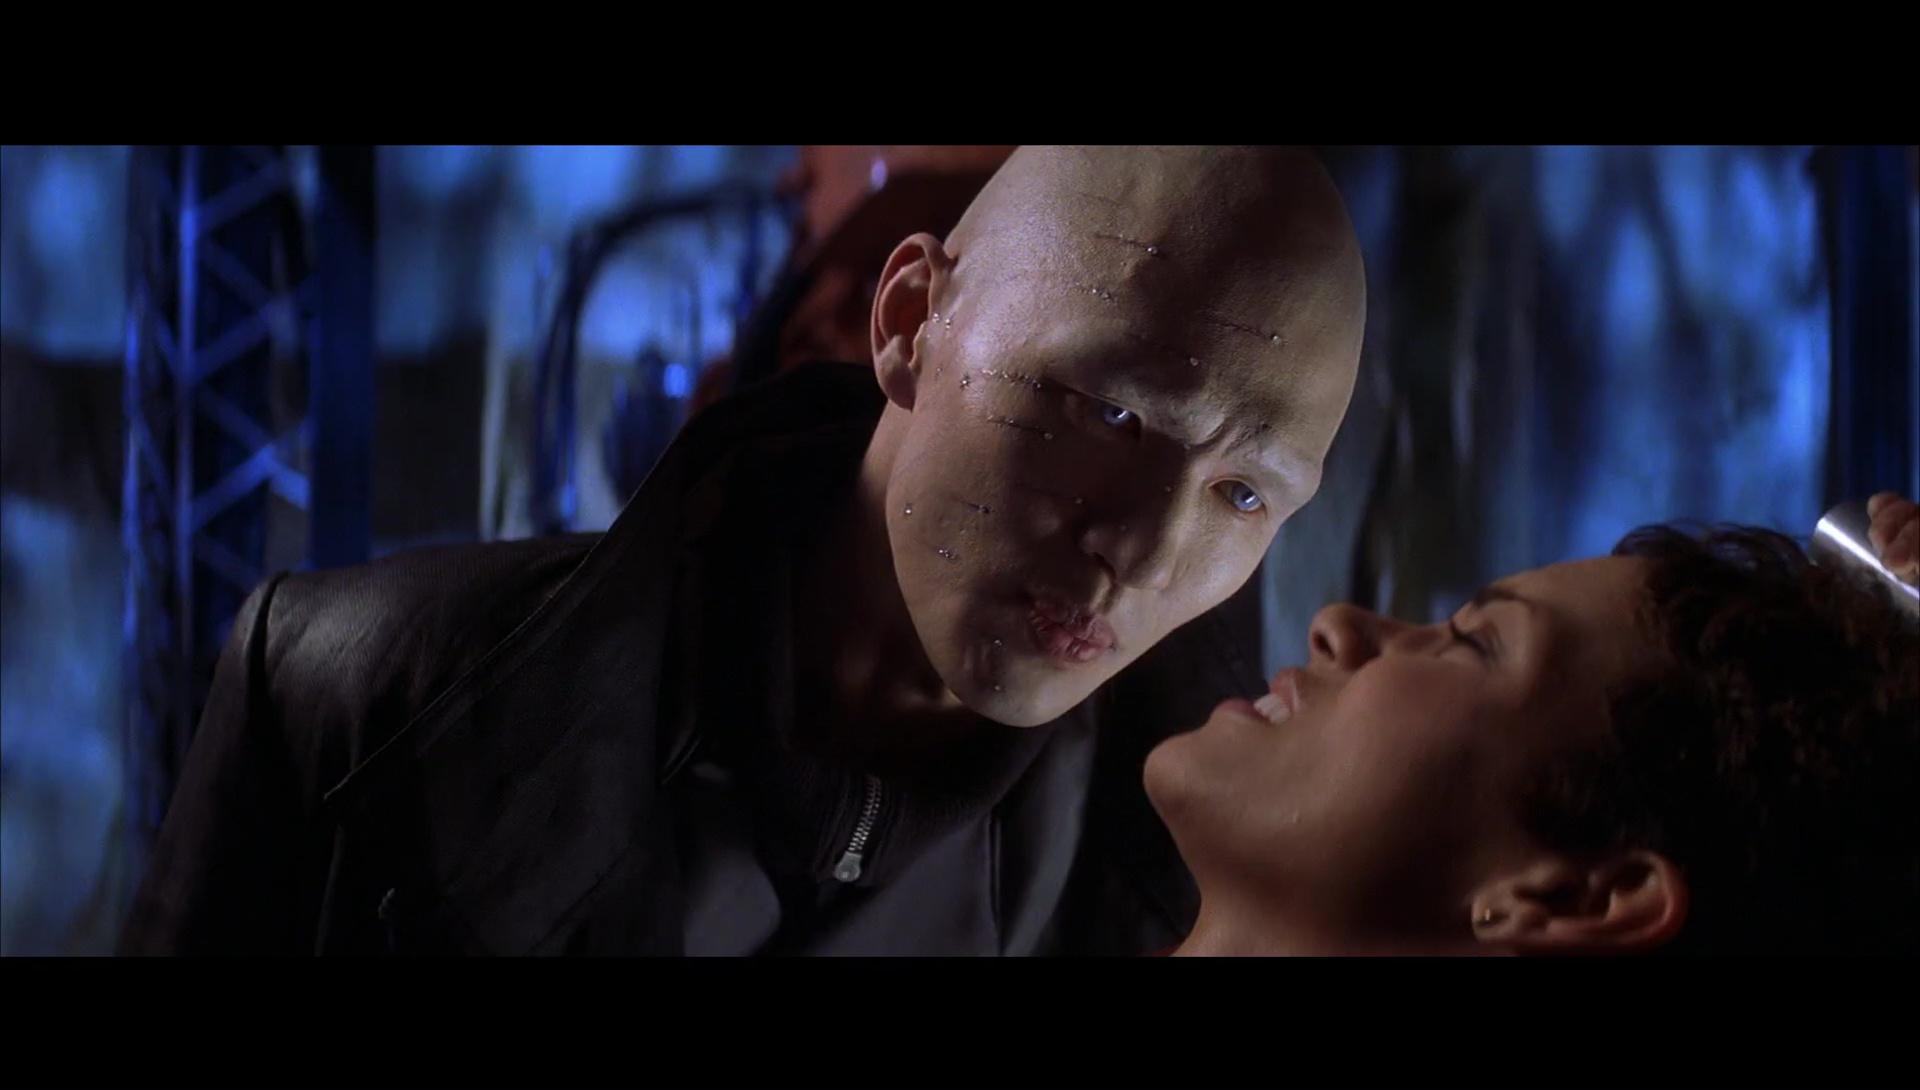 007 Otro Dia Para Morir 1080p Lat-Cast-Ing 5.1 (2002)